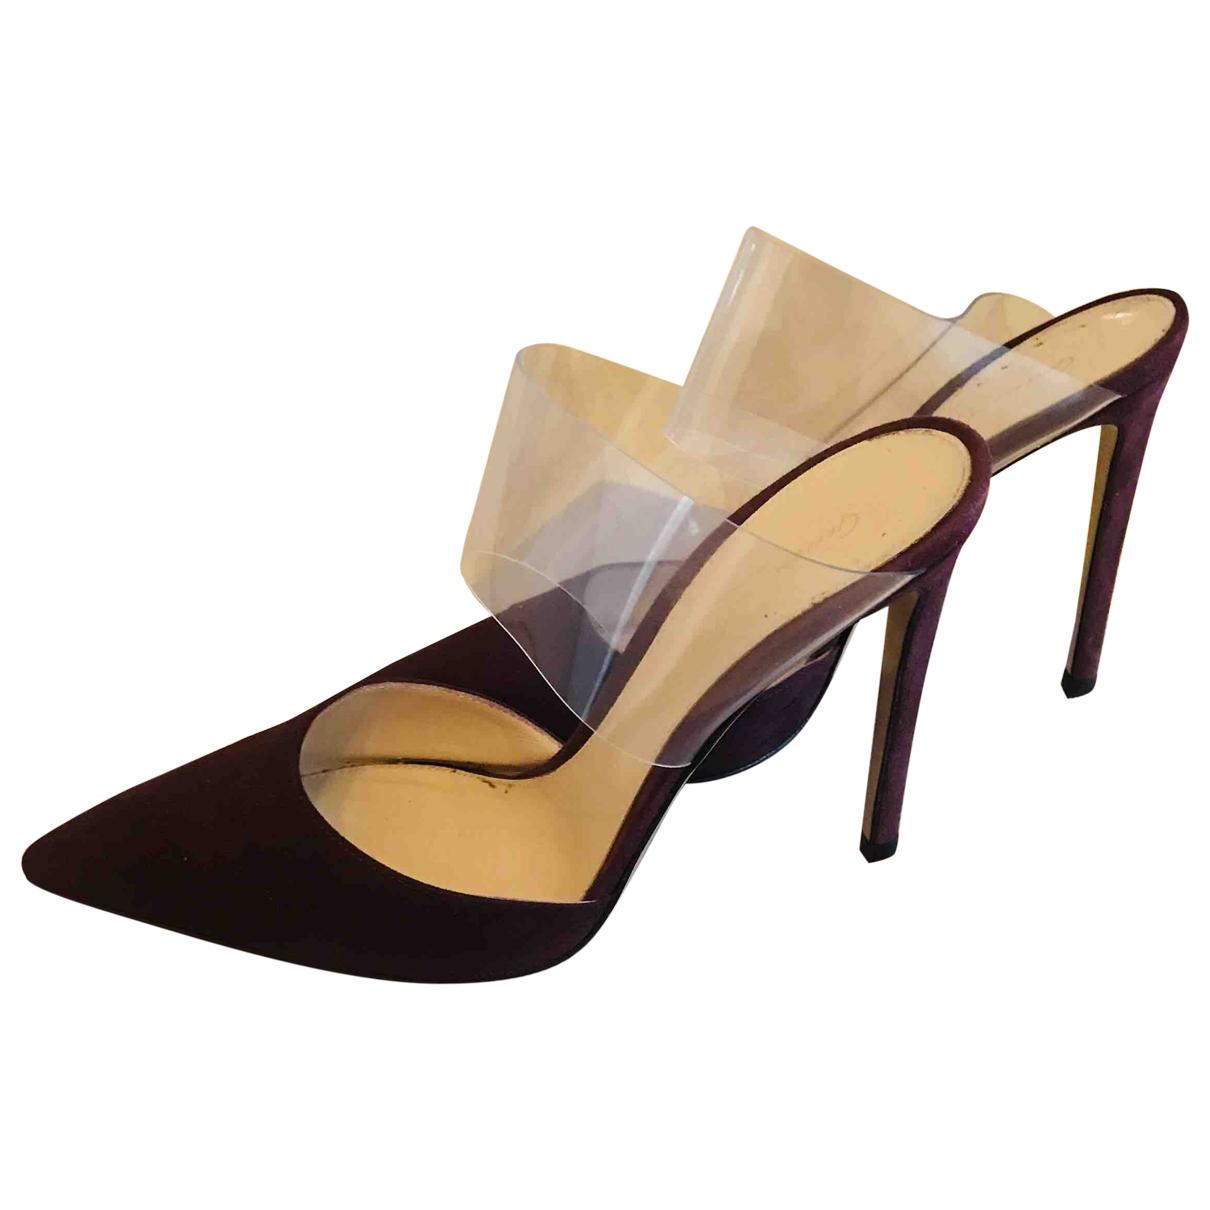 Gianvito Rossi \N Burgundy Suede Heels for Women 37.5 EU